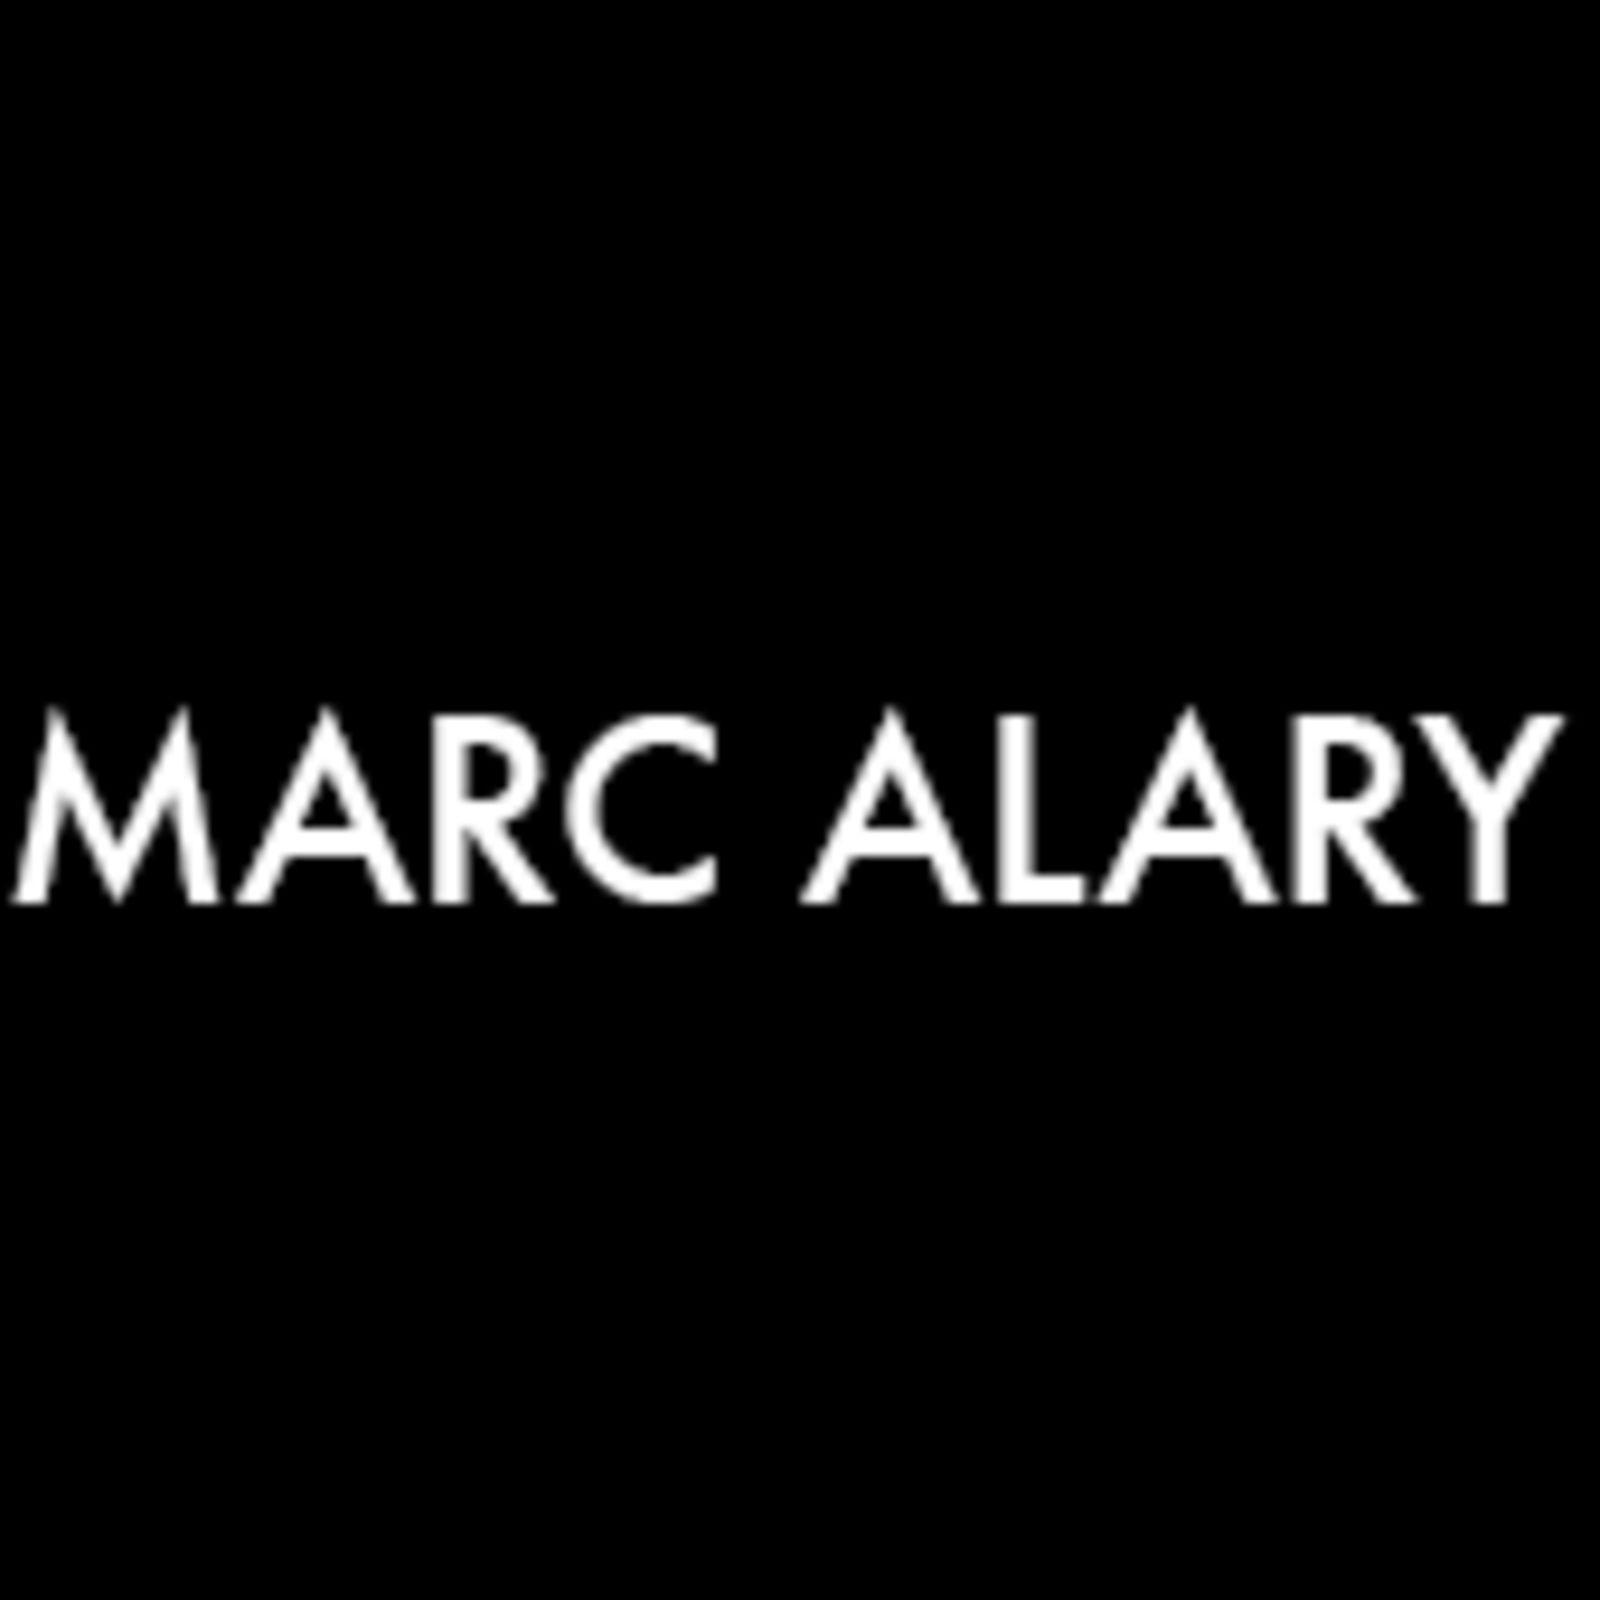 MARC ALARY